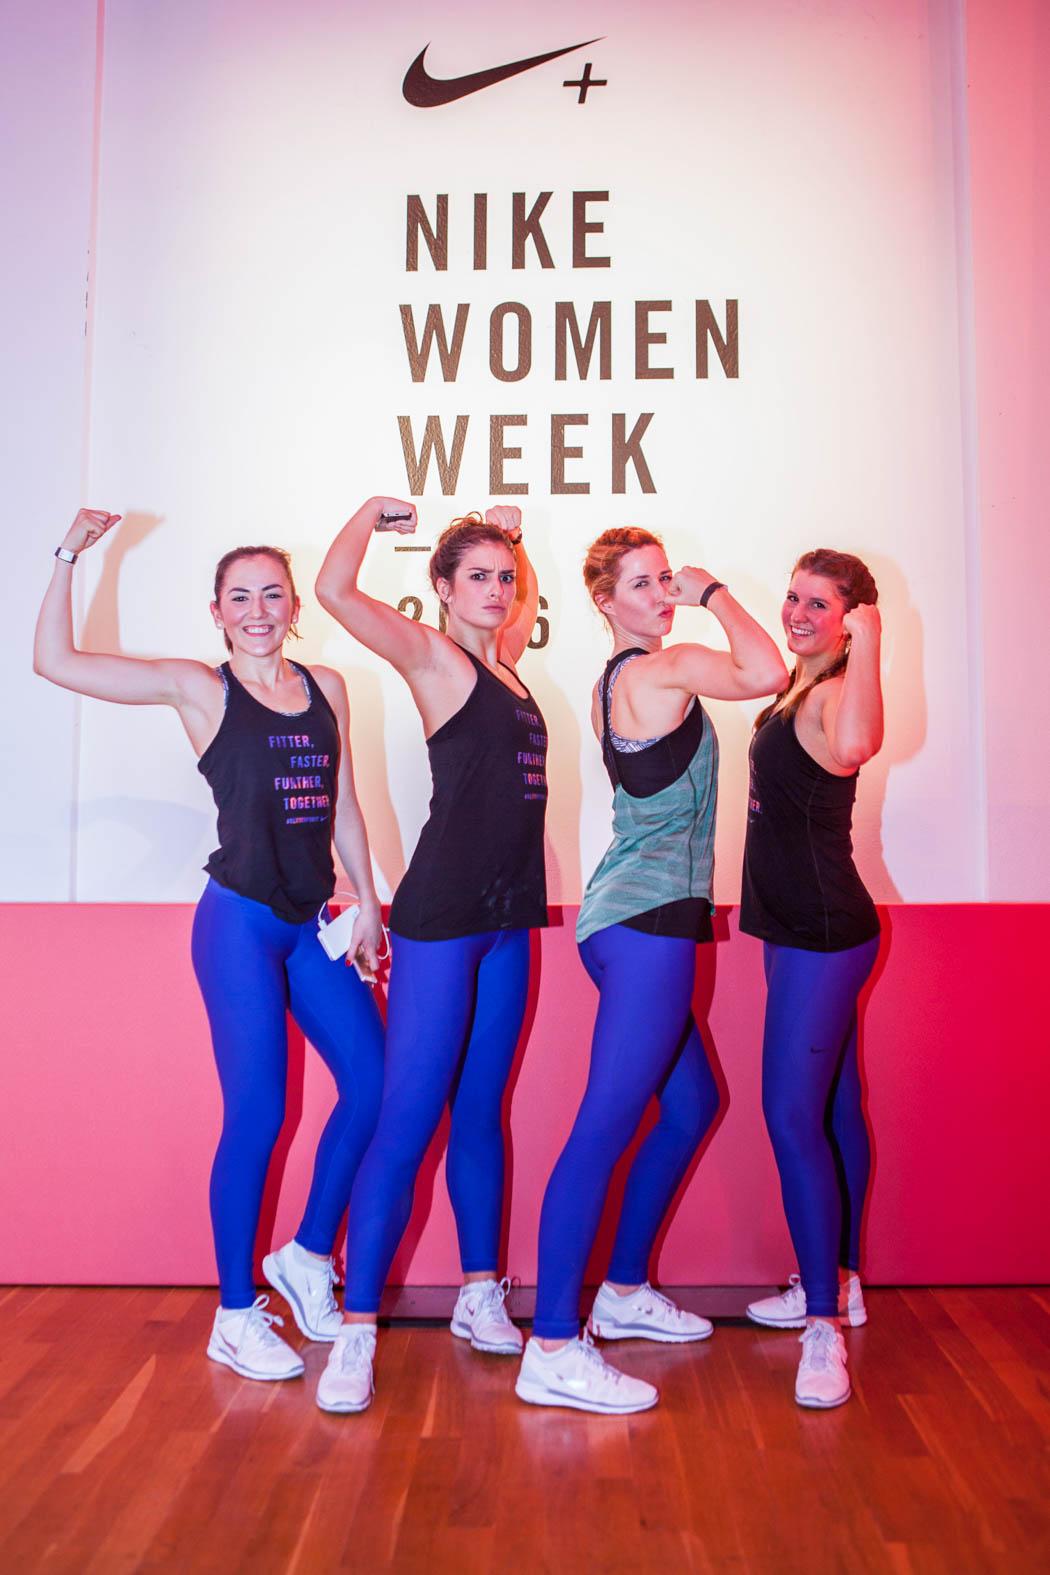 Fitnessblog-Fitnessblogger-Fitness-Blog-Blogger-Muenchen-Berlin-Deutschland-NikeWomen-Premiere-Pankow-Ballsaal-Lindarella-14